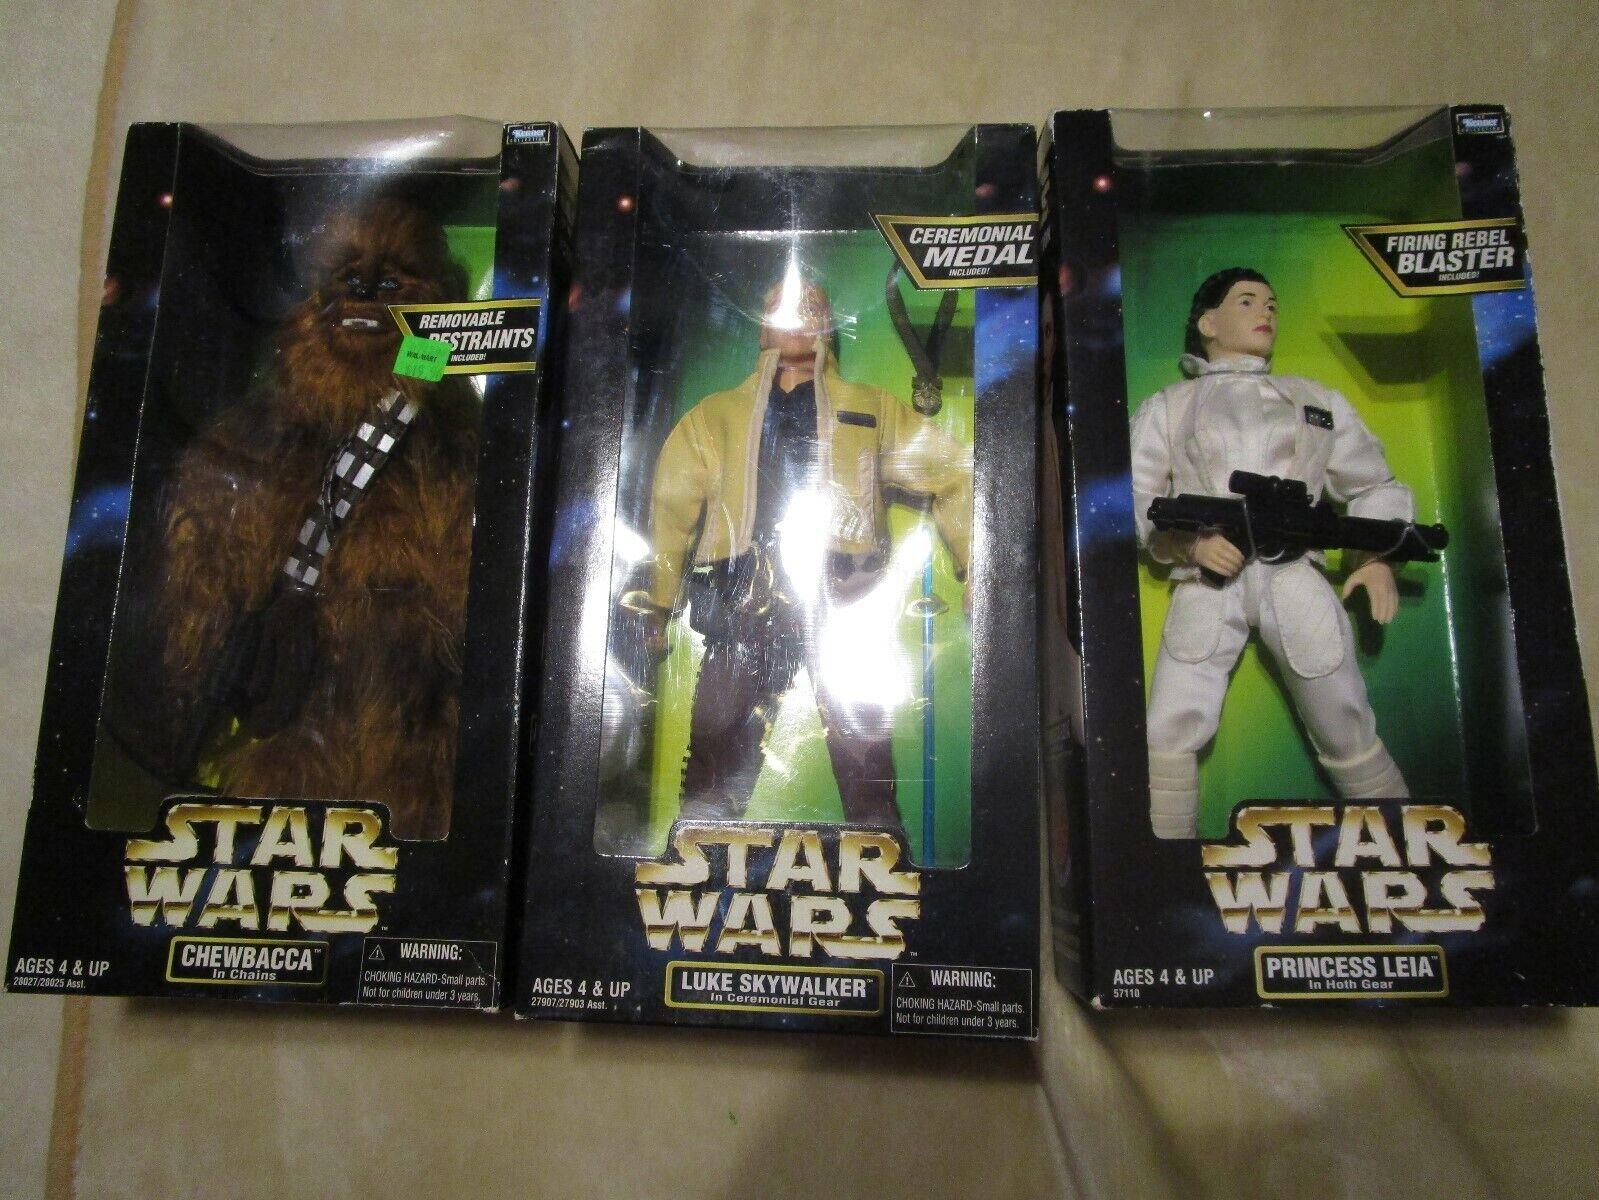 NIB 1998 Star Wars 12  Figure CHEWBACCA in Chains Luke Skywalker  Princess Leia